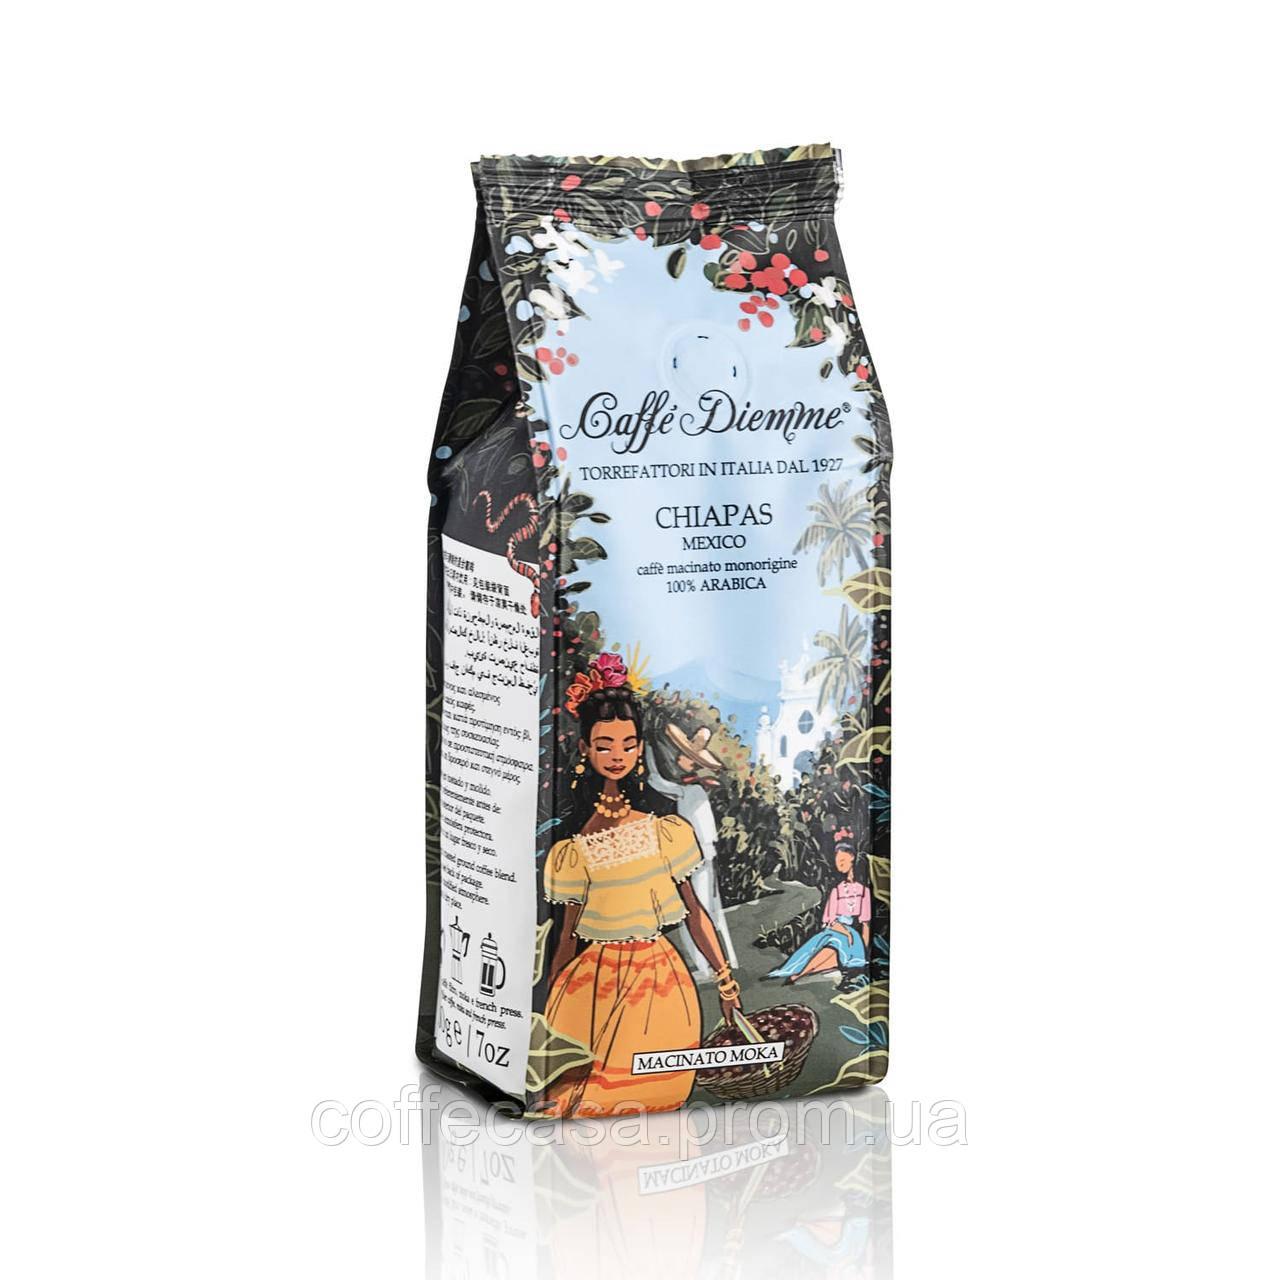 Кофе молотый Diemme CHIAPAS 200 г